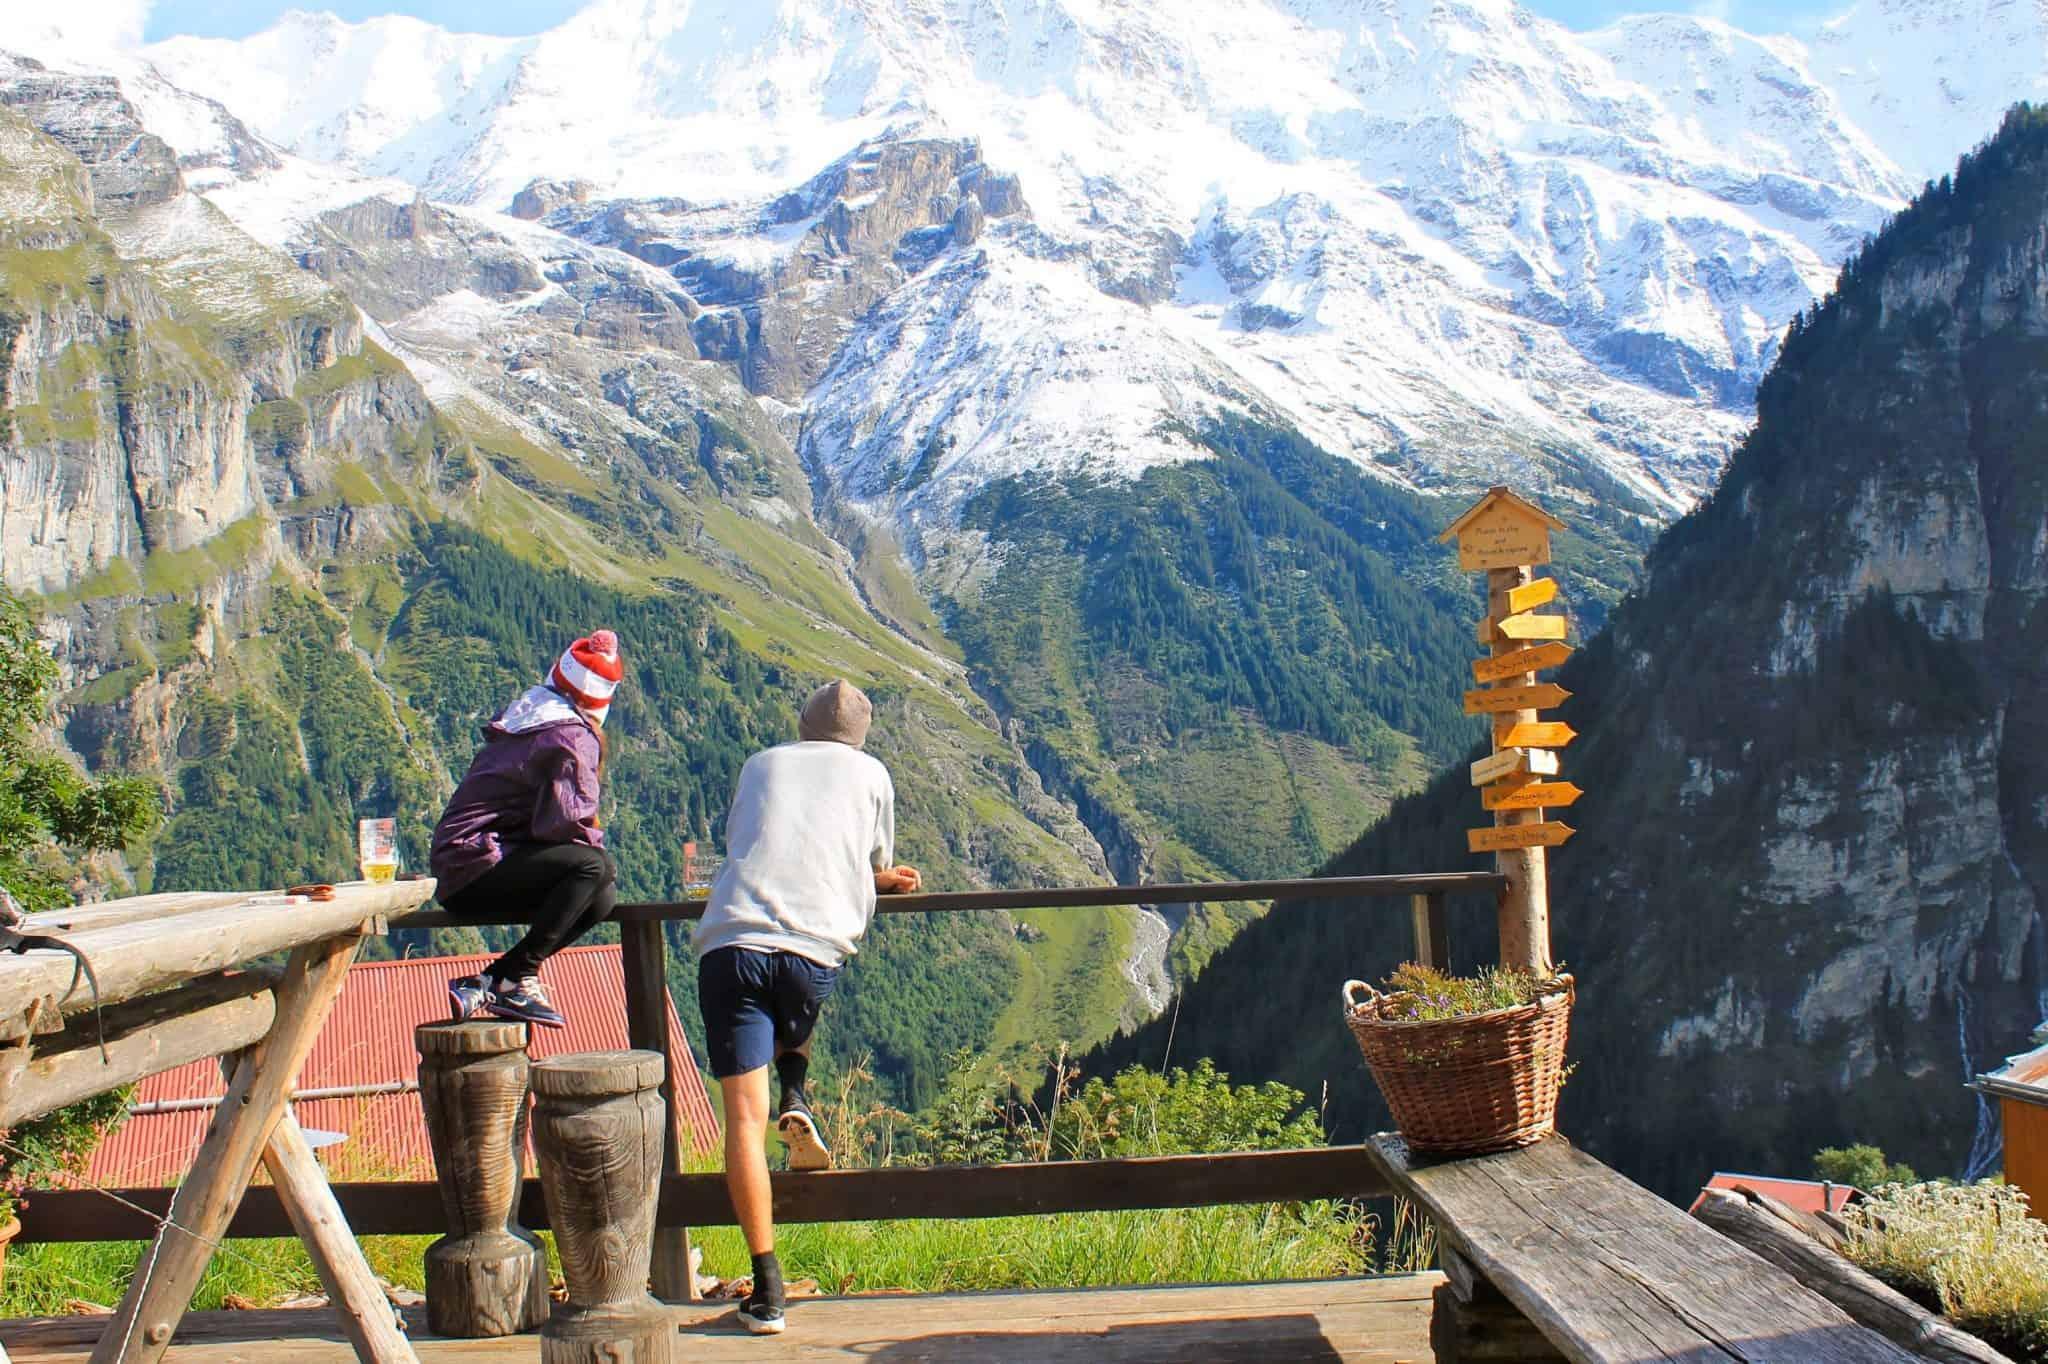 The view in Switzerland